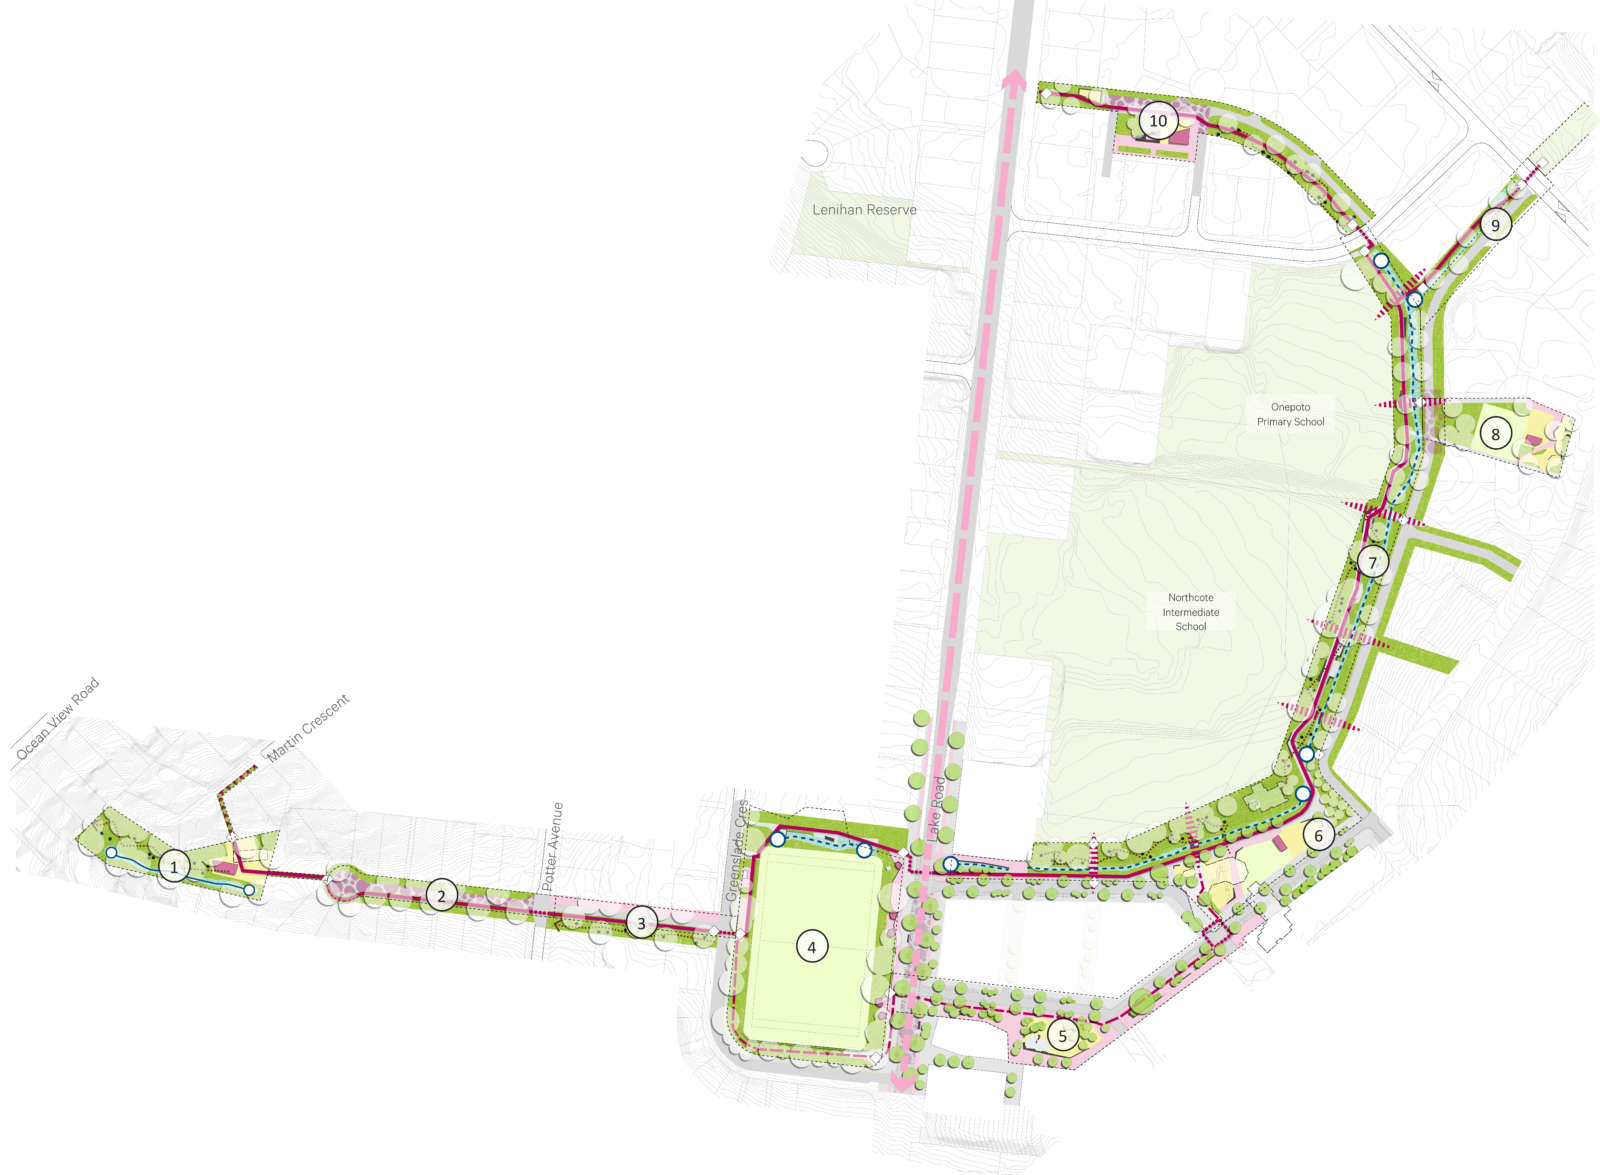 Comnunity Greenway Master Plan